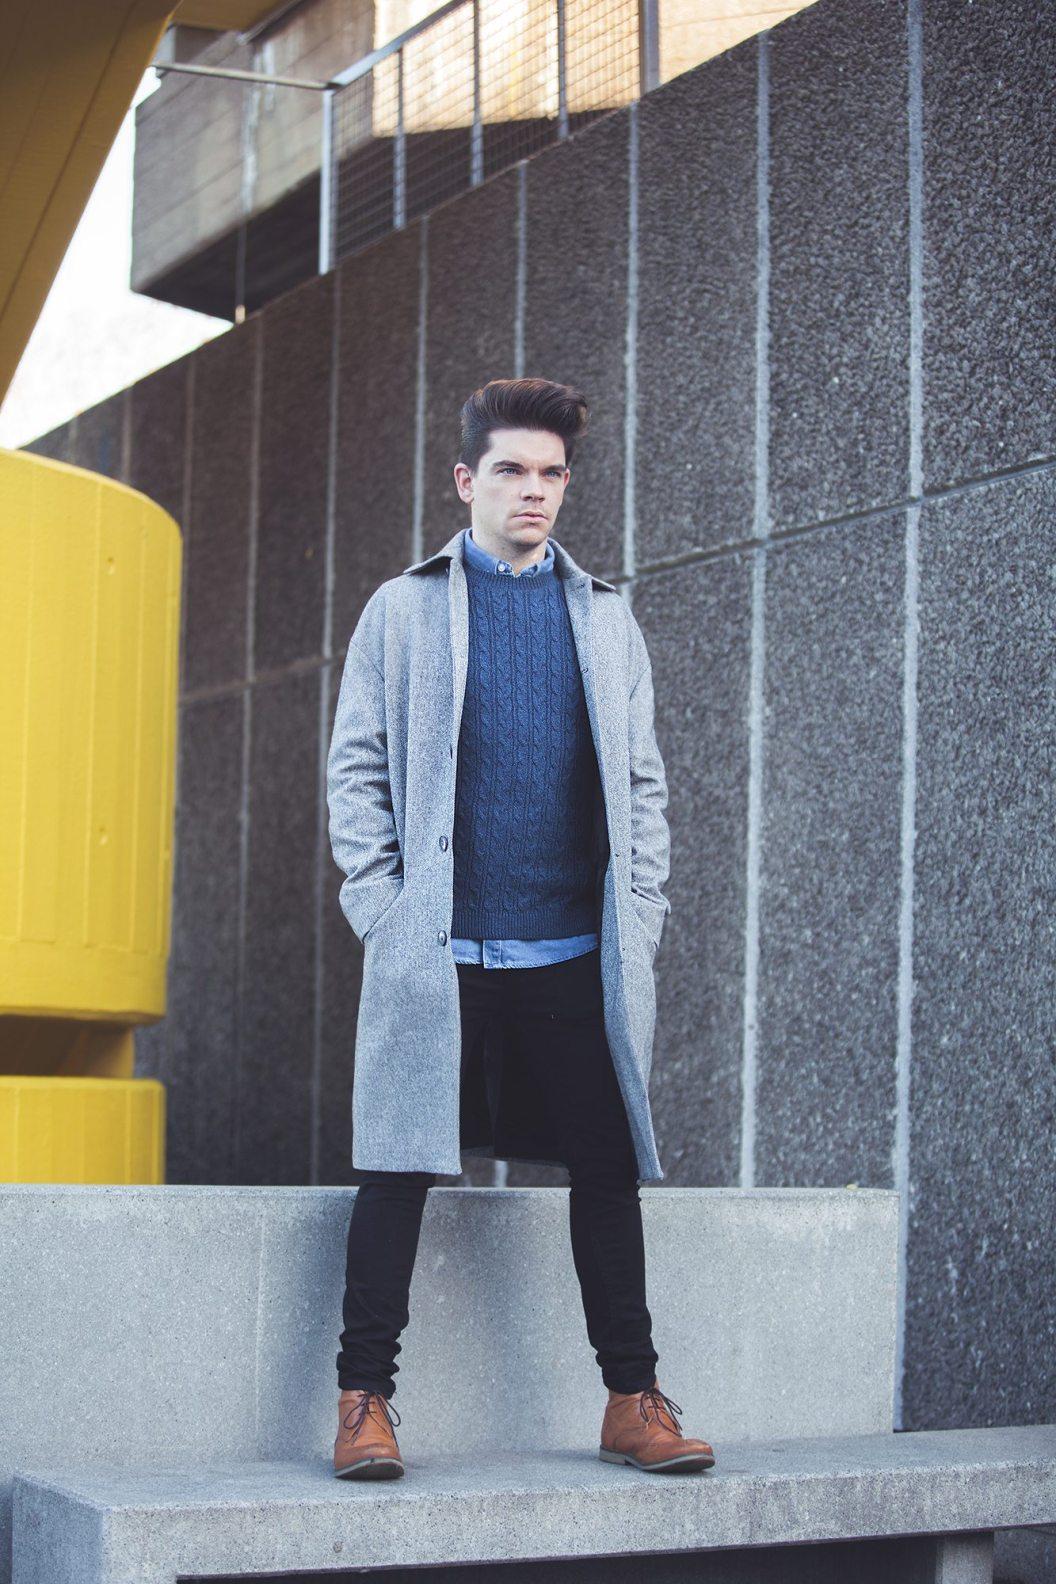 Robin_James_The_Utter_Gutter_Topman_Clothes_Winter_Shoot_Grey_Coat_Cable_Knit_Denim_Shirt_Portrait